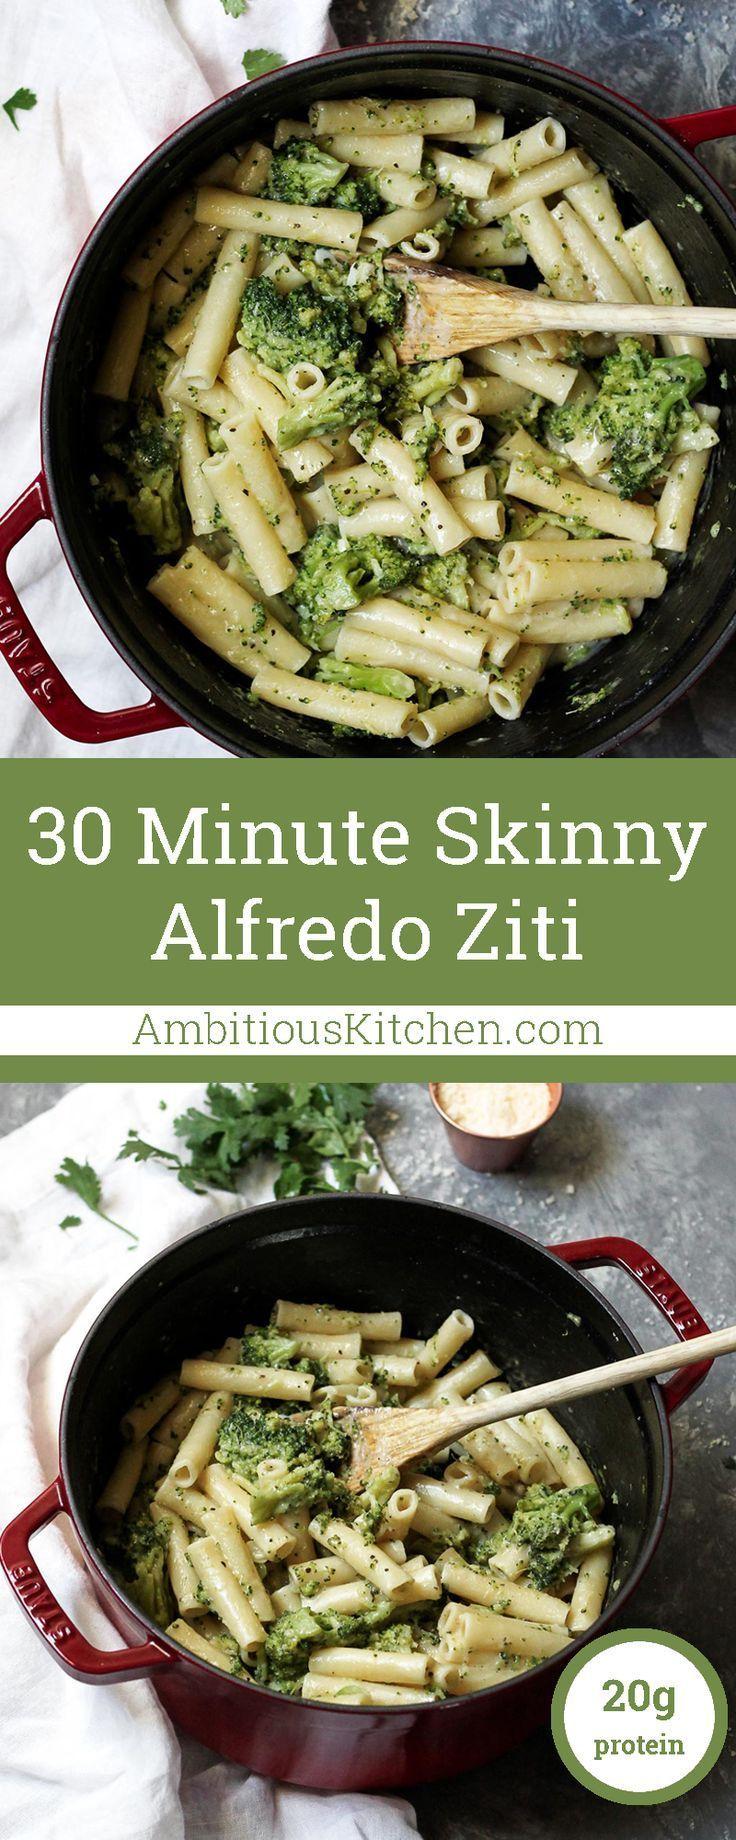 30 Minute Skinny Alfredo Ziti With Broccoli  Recipe -9027